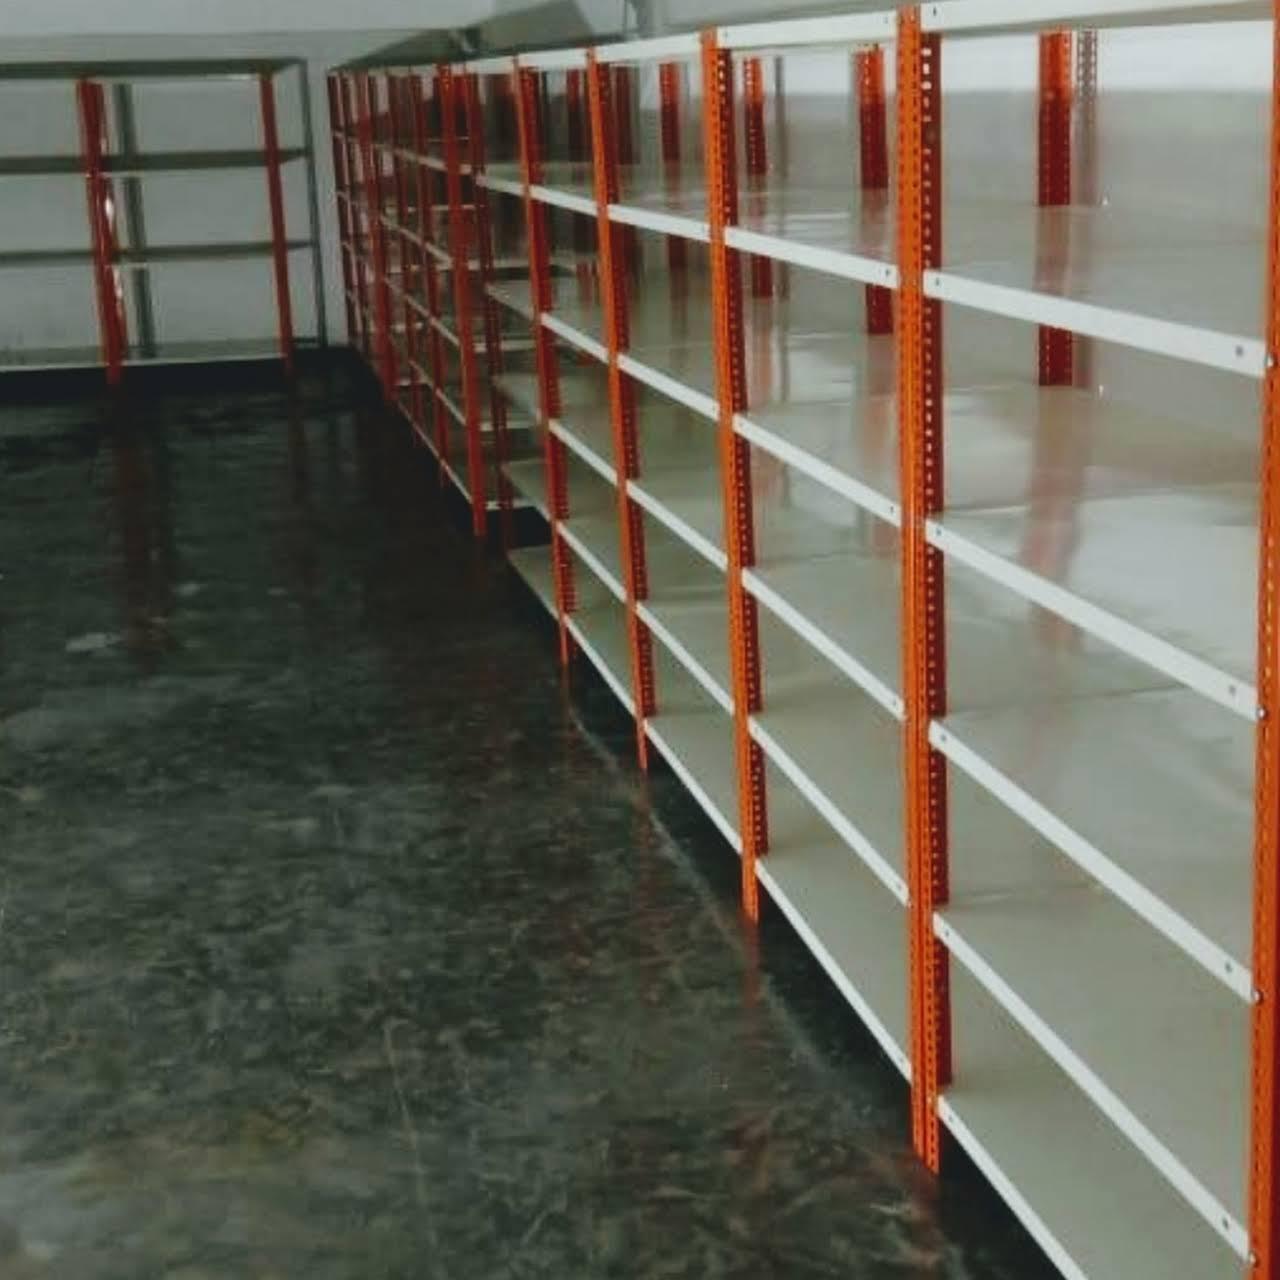 SAI STORAGE SYSTEMS - Manufacturer of : Display Racks